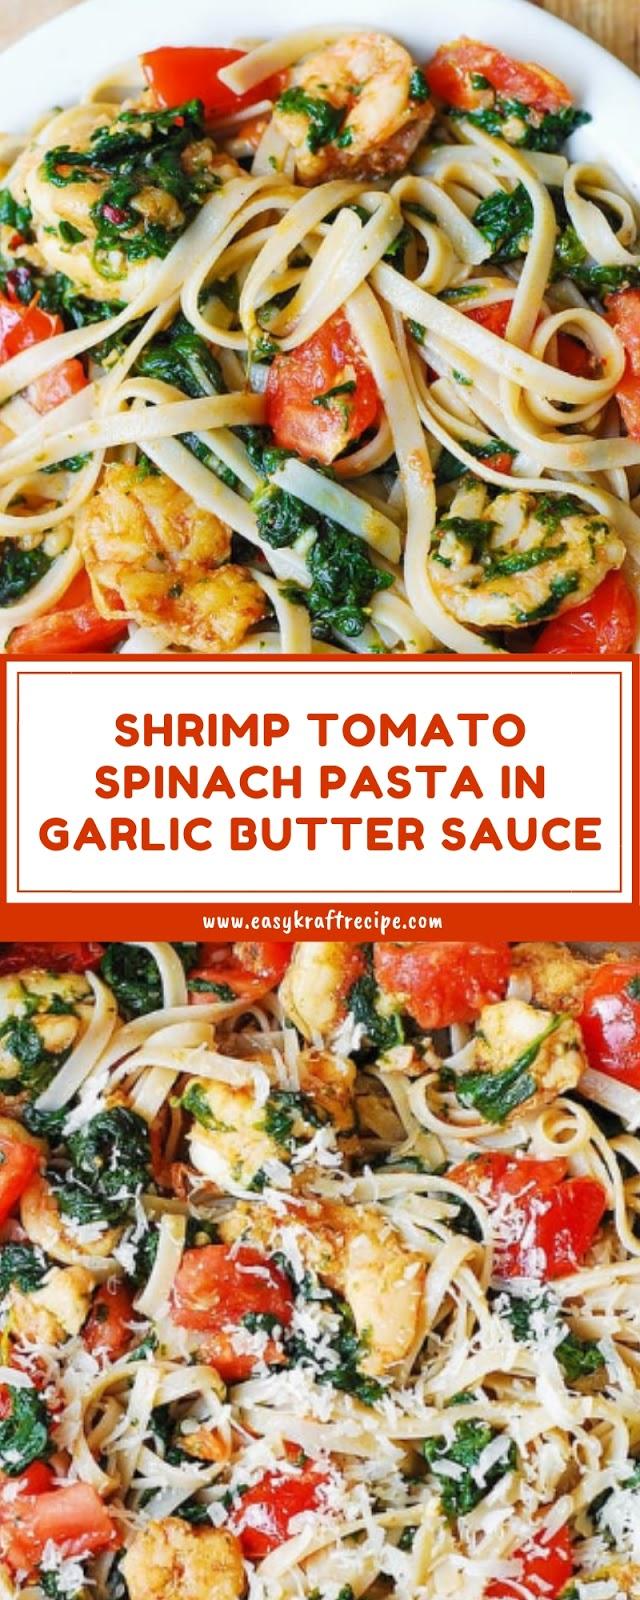 SHRIMP TOMATO SPINACH PASTA IN GARLIC BUTTER SAUCE